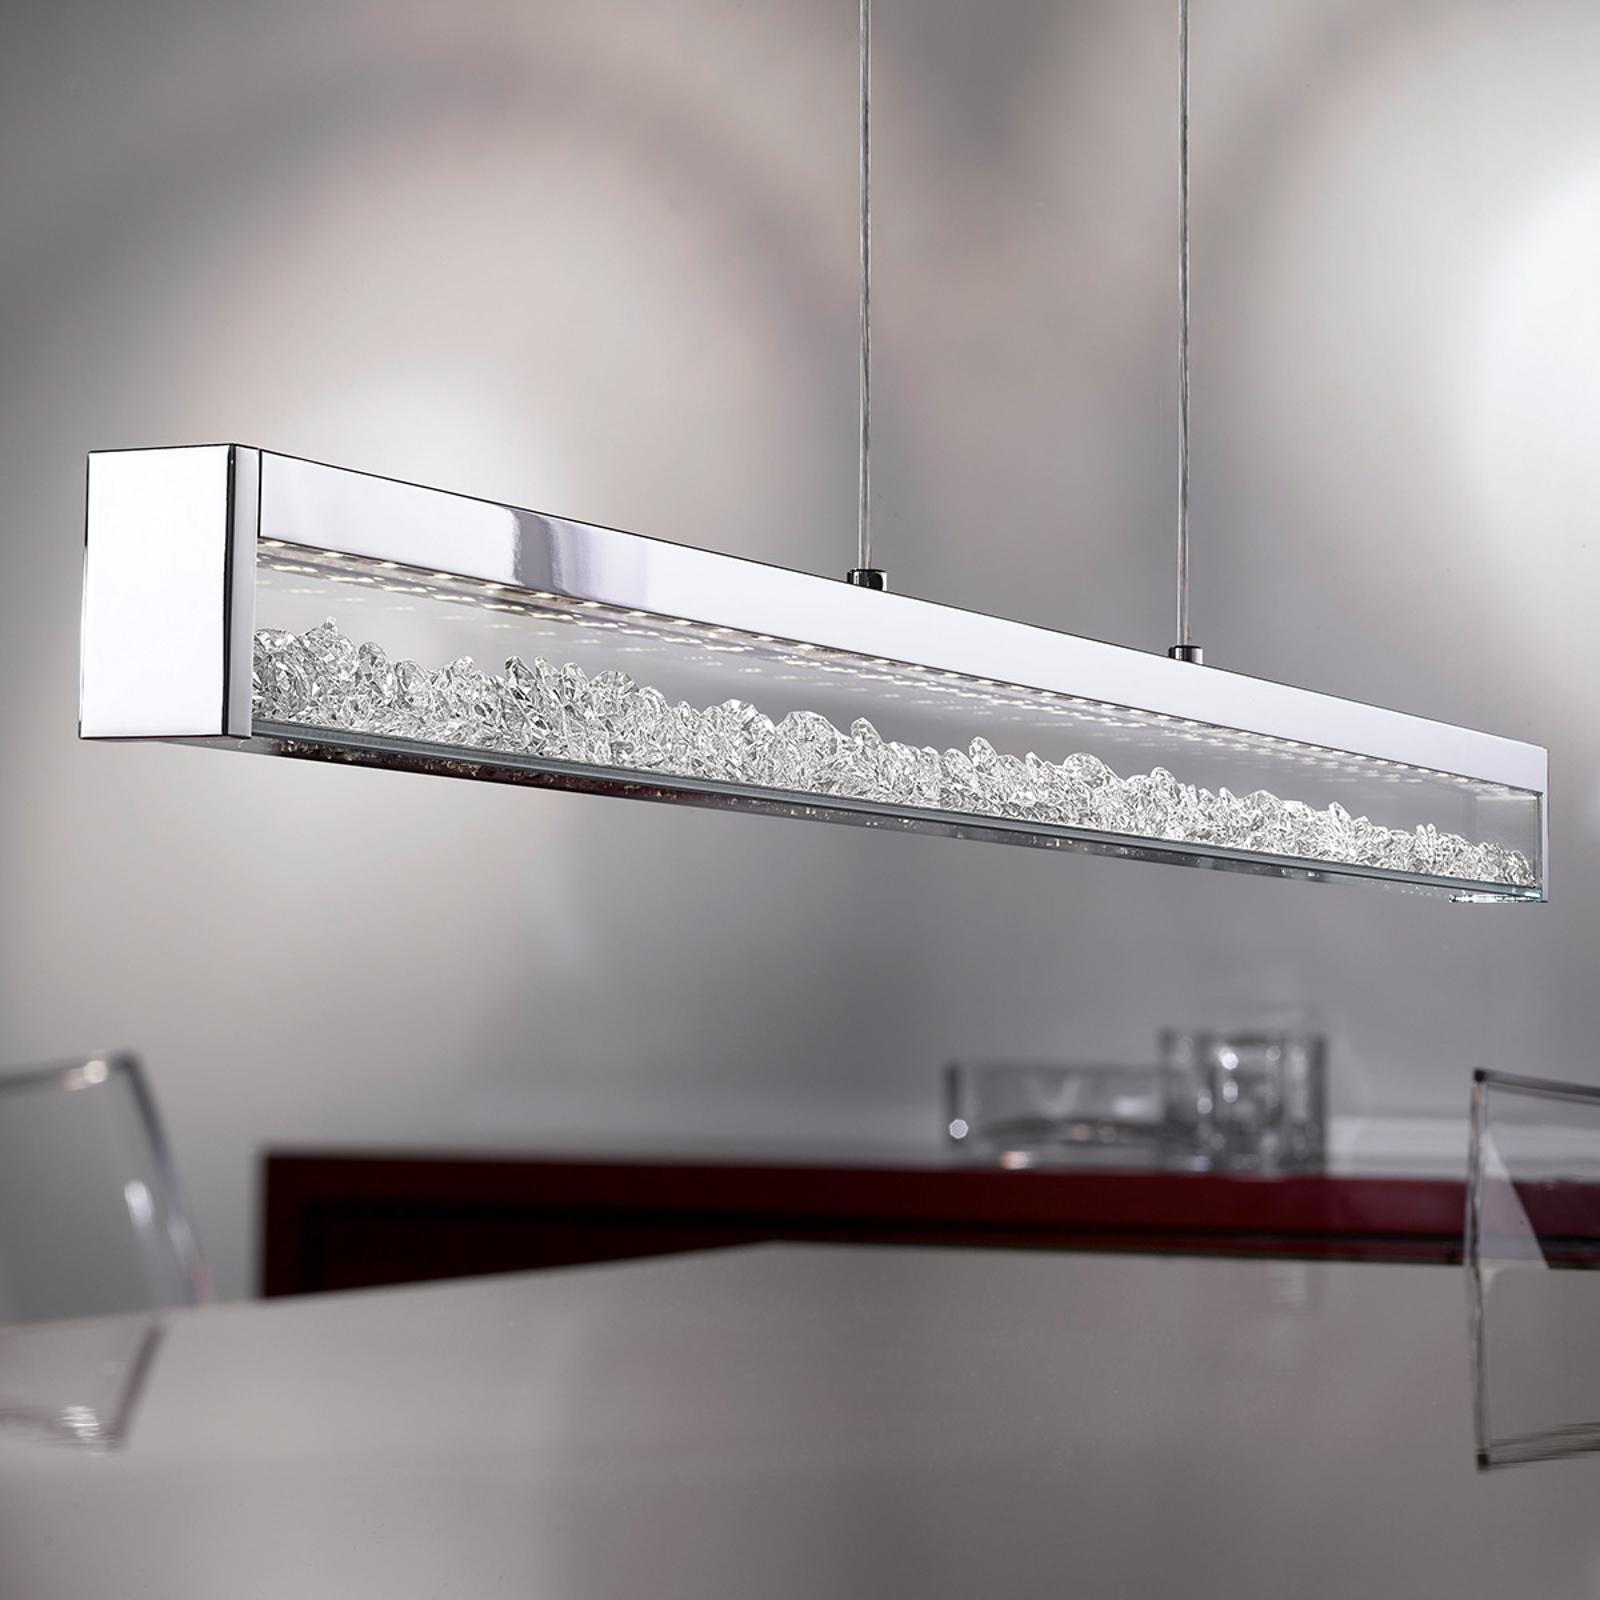 LED hanglamp Cardito met Asfour kristal 100 cm